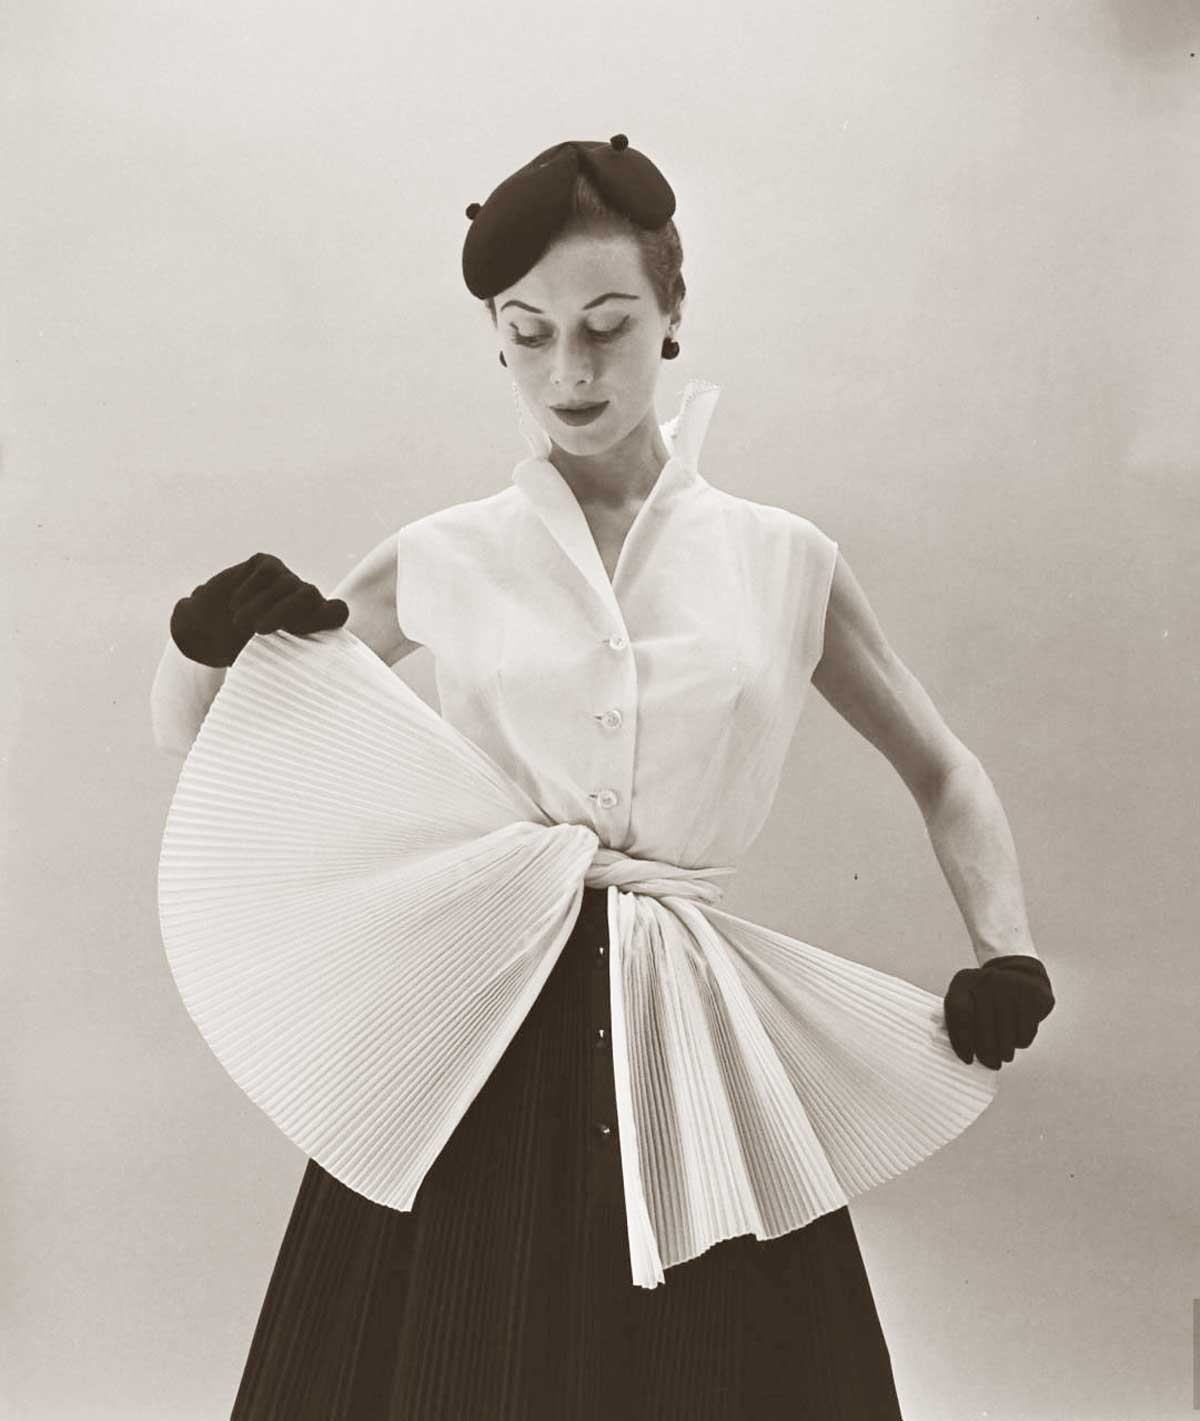 Gigi-Terwalgne-Spring-Collection-February-1952.jpg